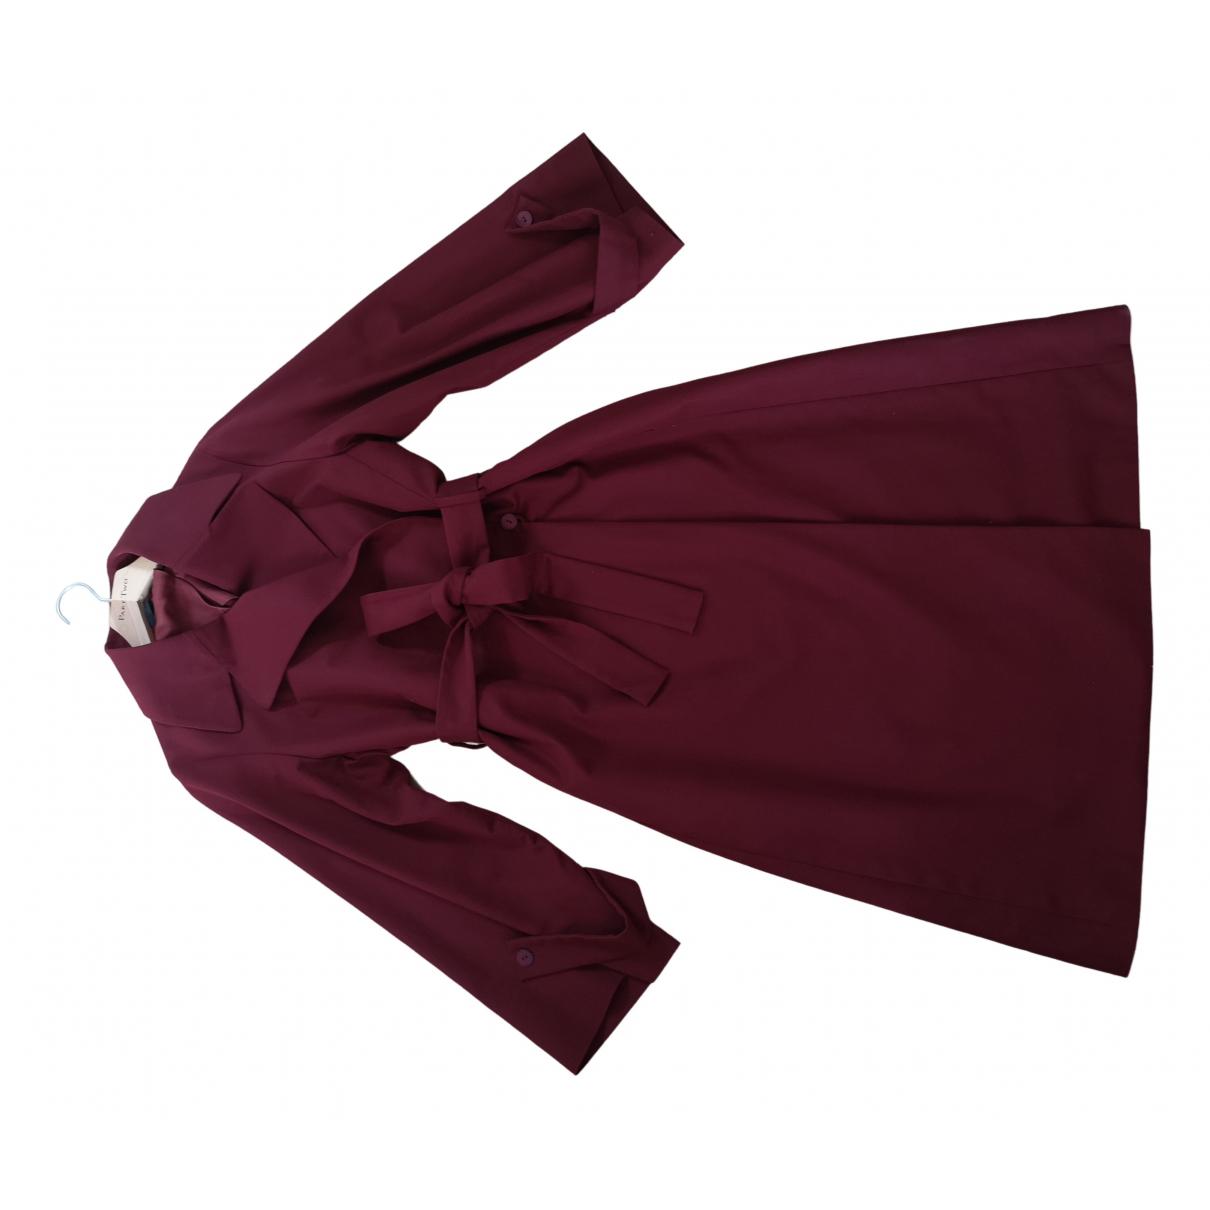 The Row \N Burgundy Cotton coat for Women L International